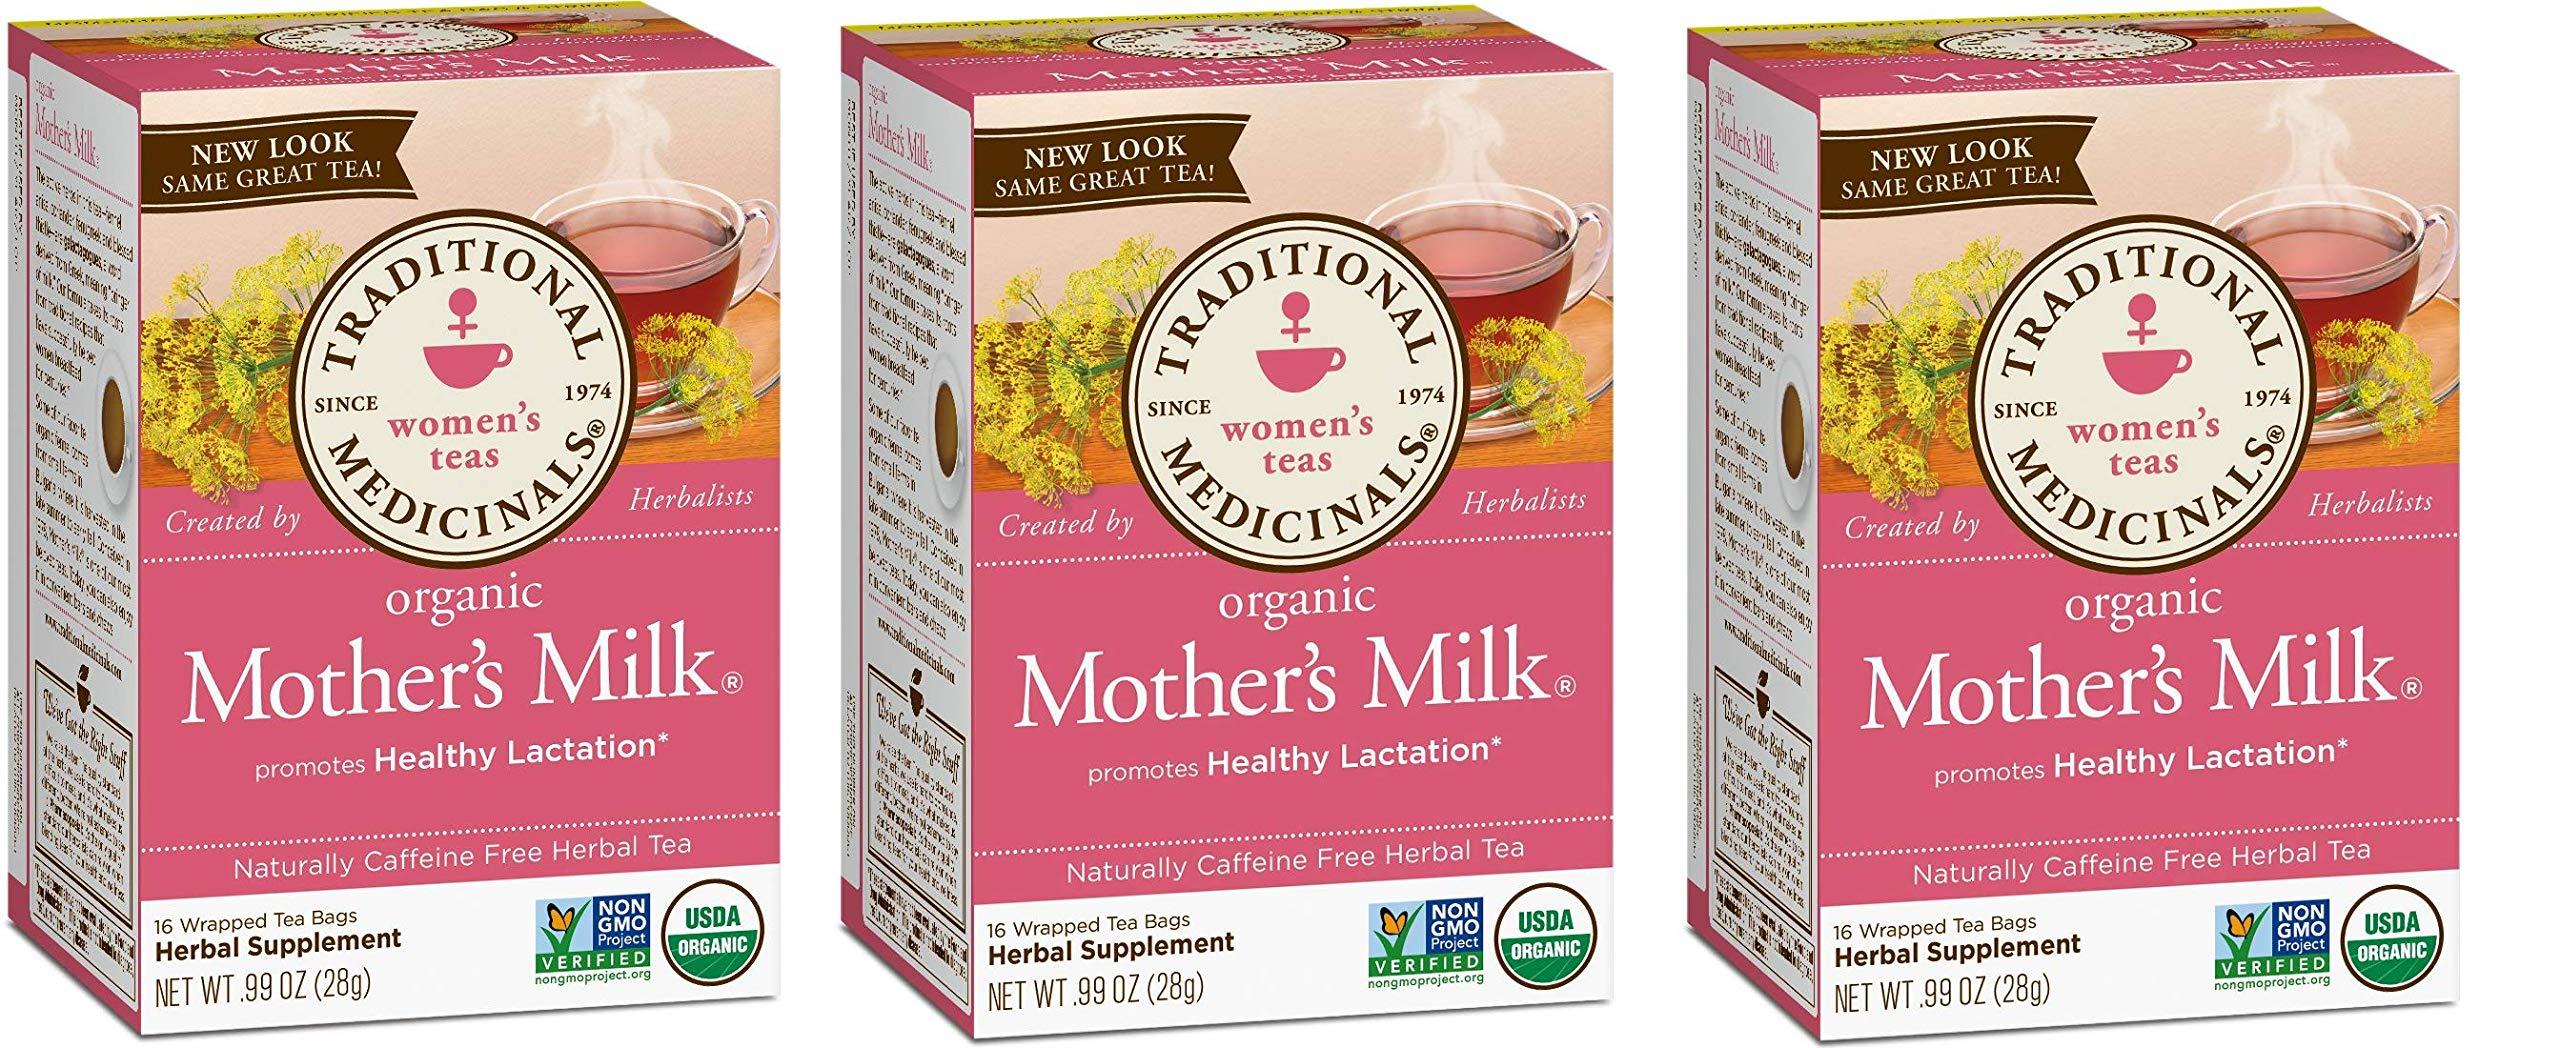 Traditional Medicinals Teas Organic Mother's Milk Tea Bags, 16 Count - 3 Pack by Traditional Medicinals